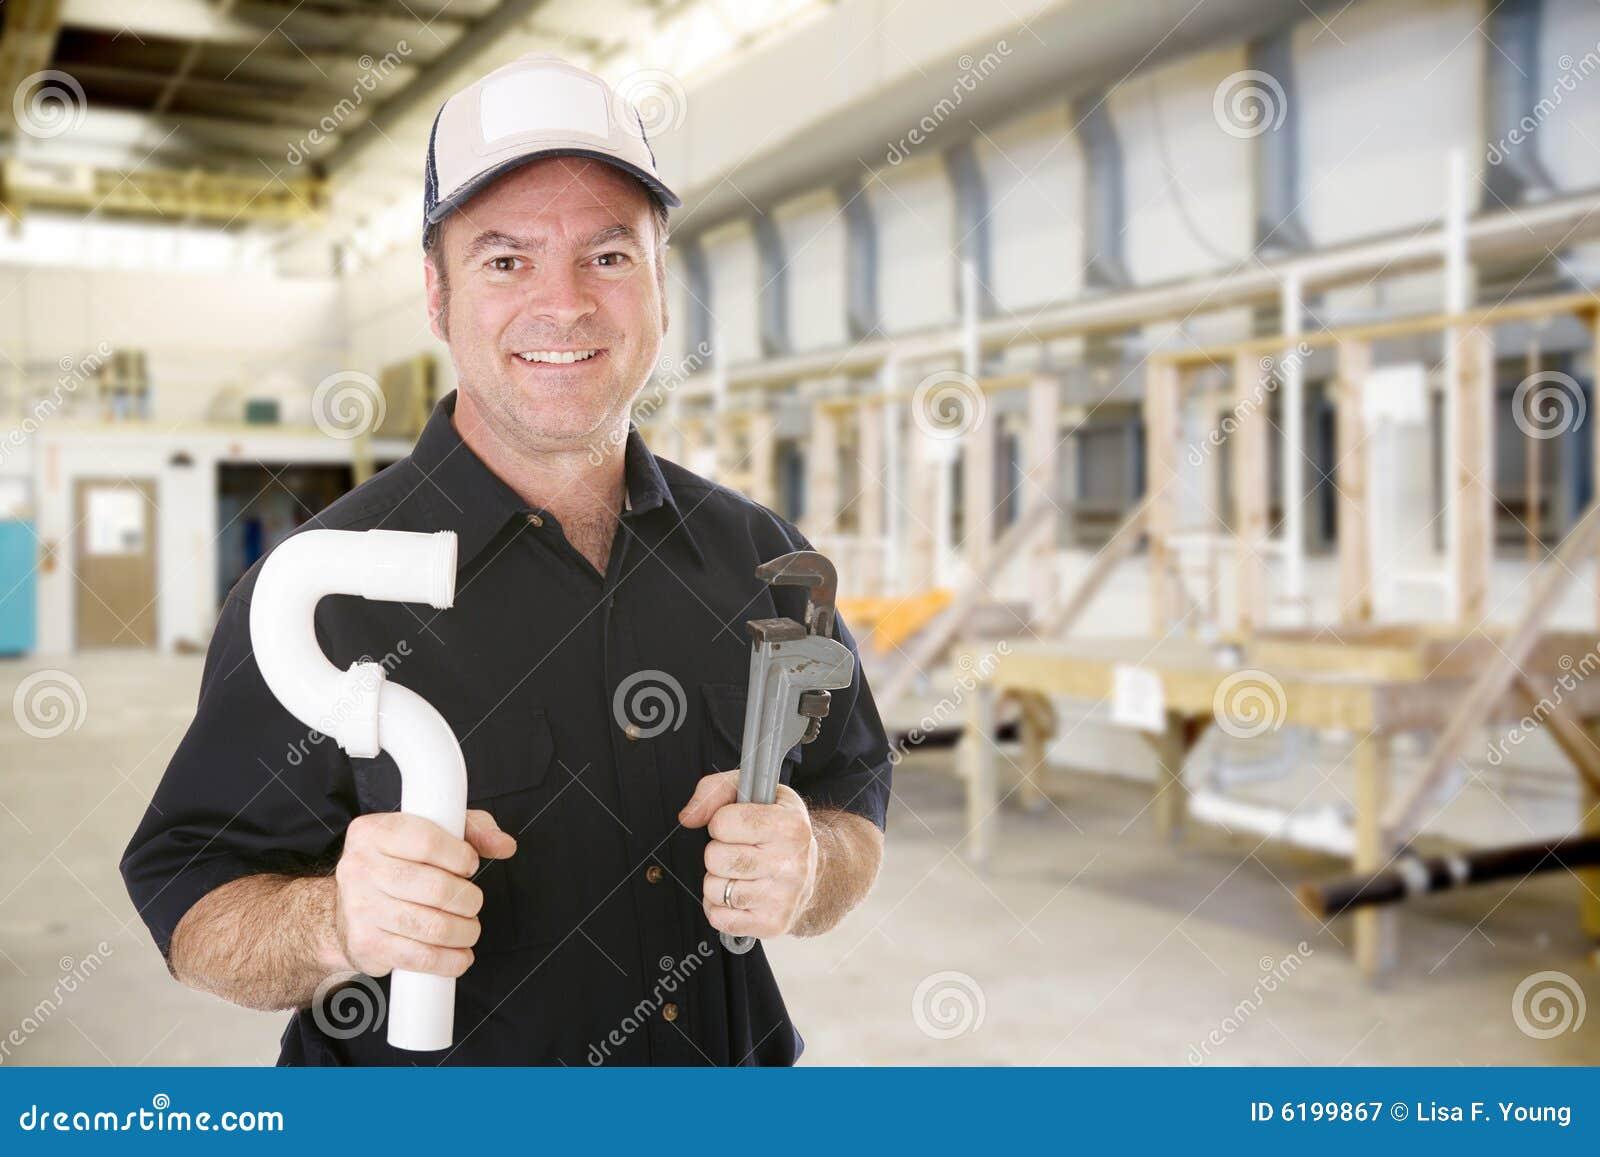 start berk c plumbing female in your technical plumber career wanted plumbers school today